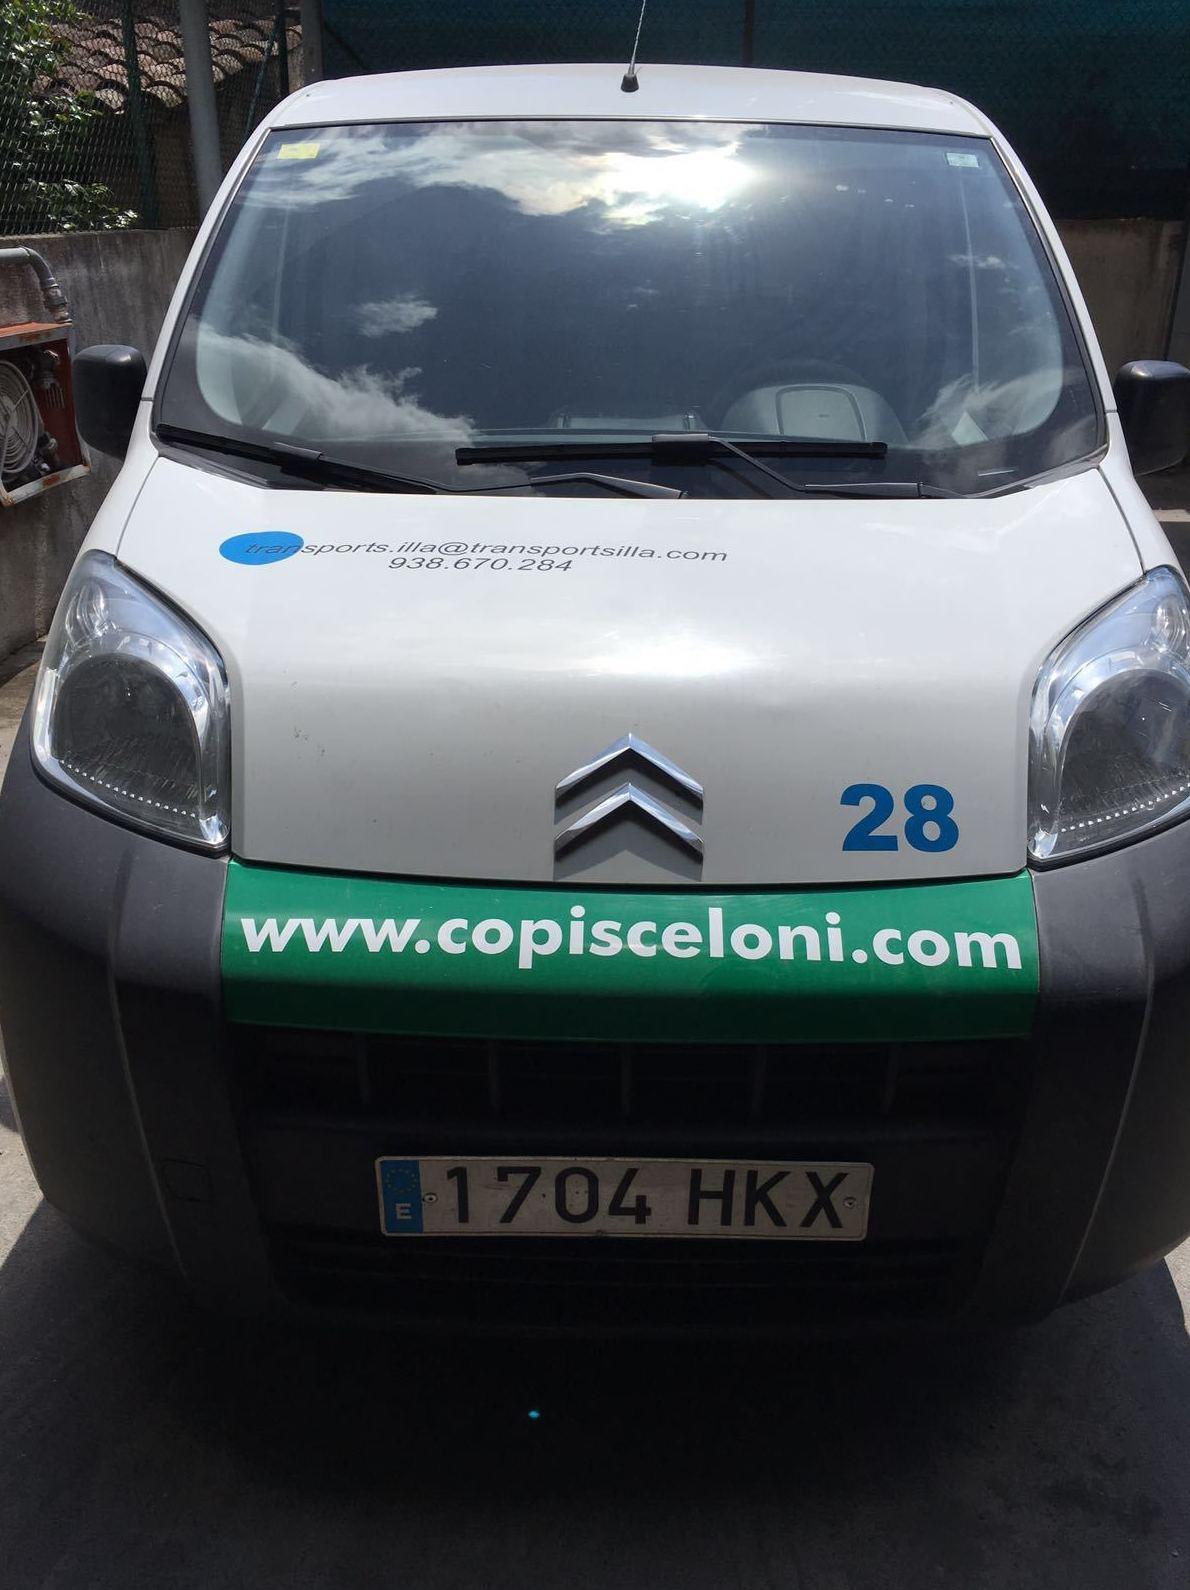 Foto 27 de Mensajería en Sant Celoni | Illa Transports